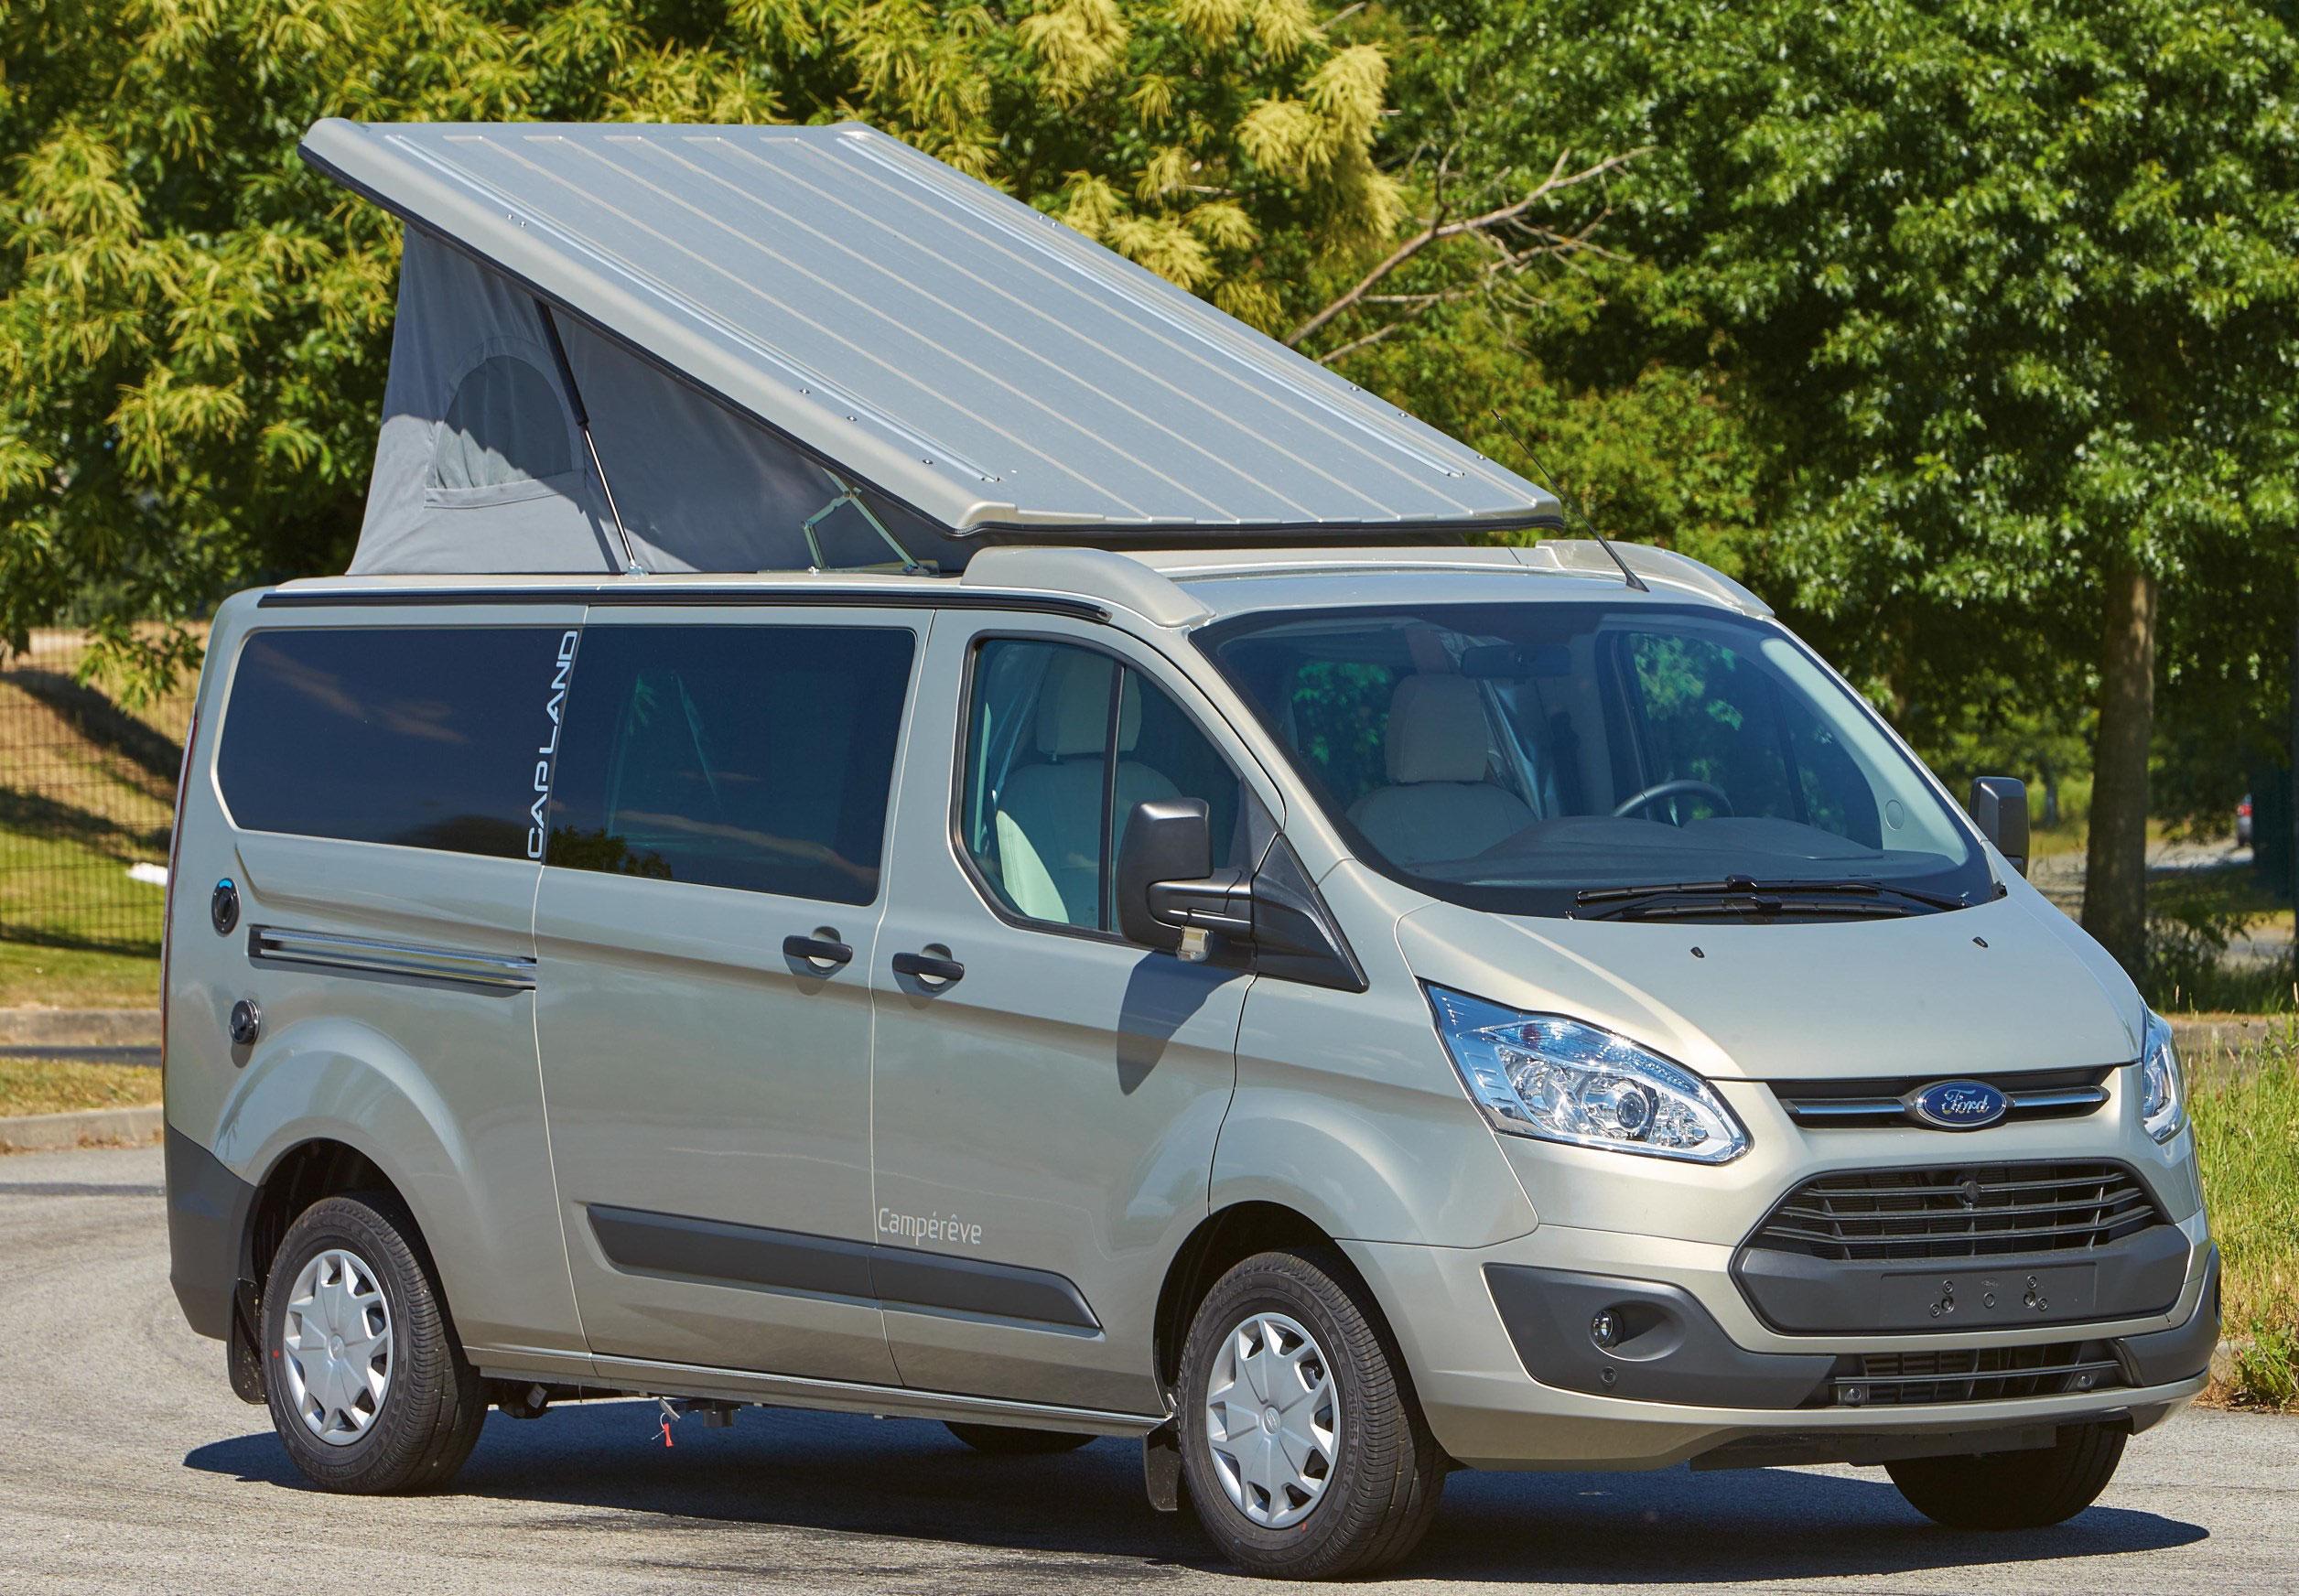 Ford Capland Camper